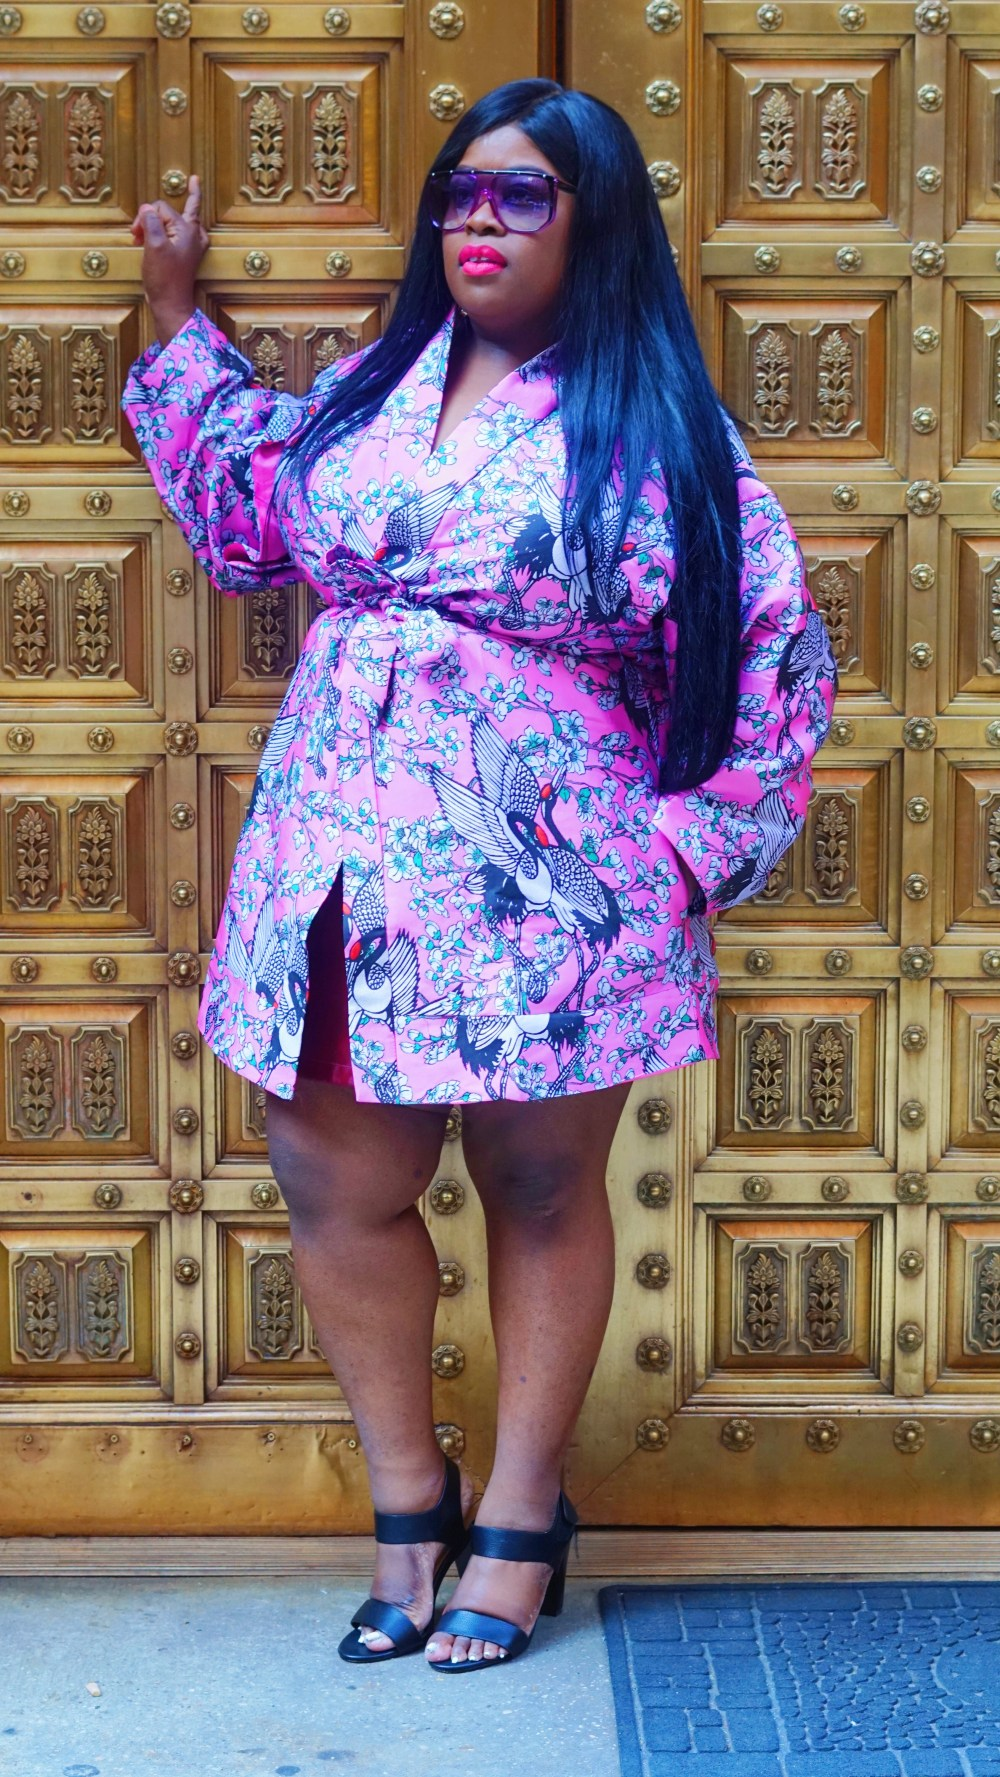 ASOS Kimono in Cherry Blossom Jacquard .....